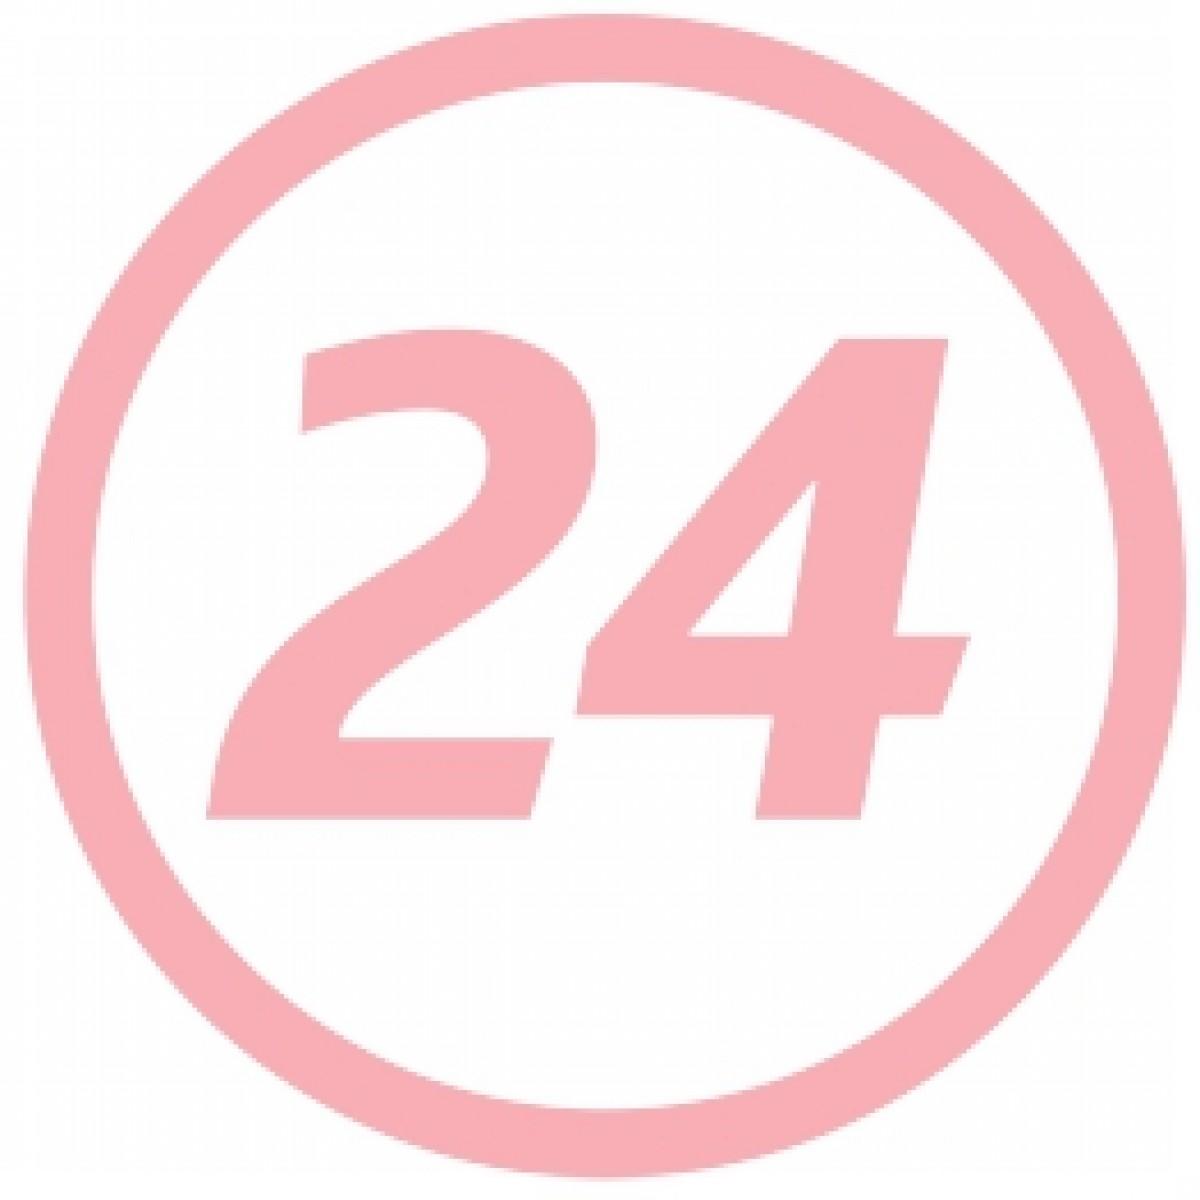 Nenedent- Baby Pasta De Dinti Pentru Bebelusi 6+Luni+Periuta Tip Degetar, 20ml